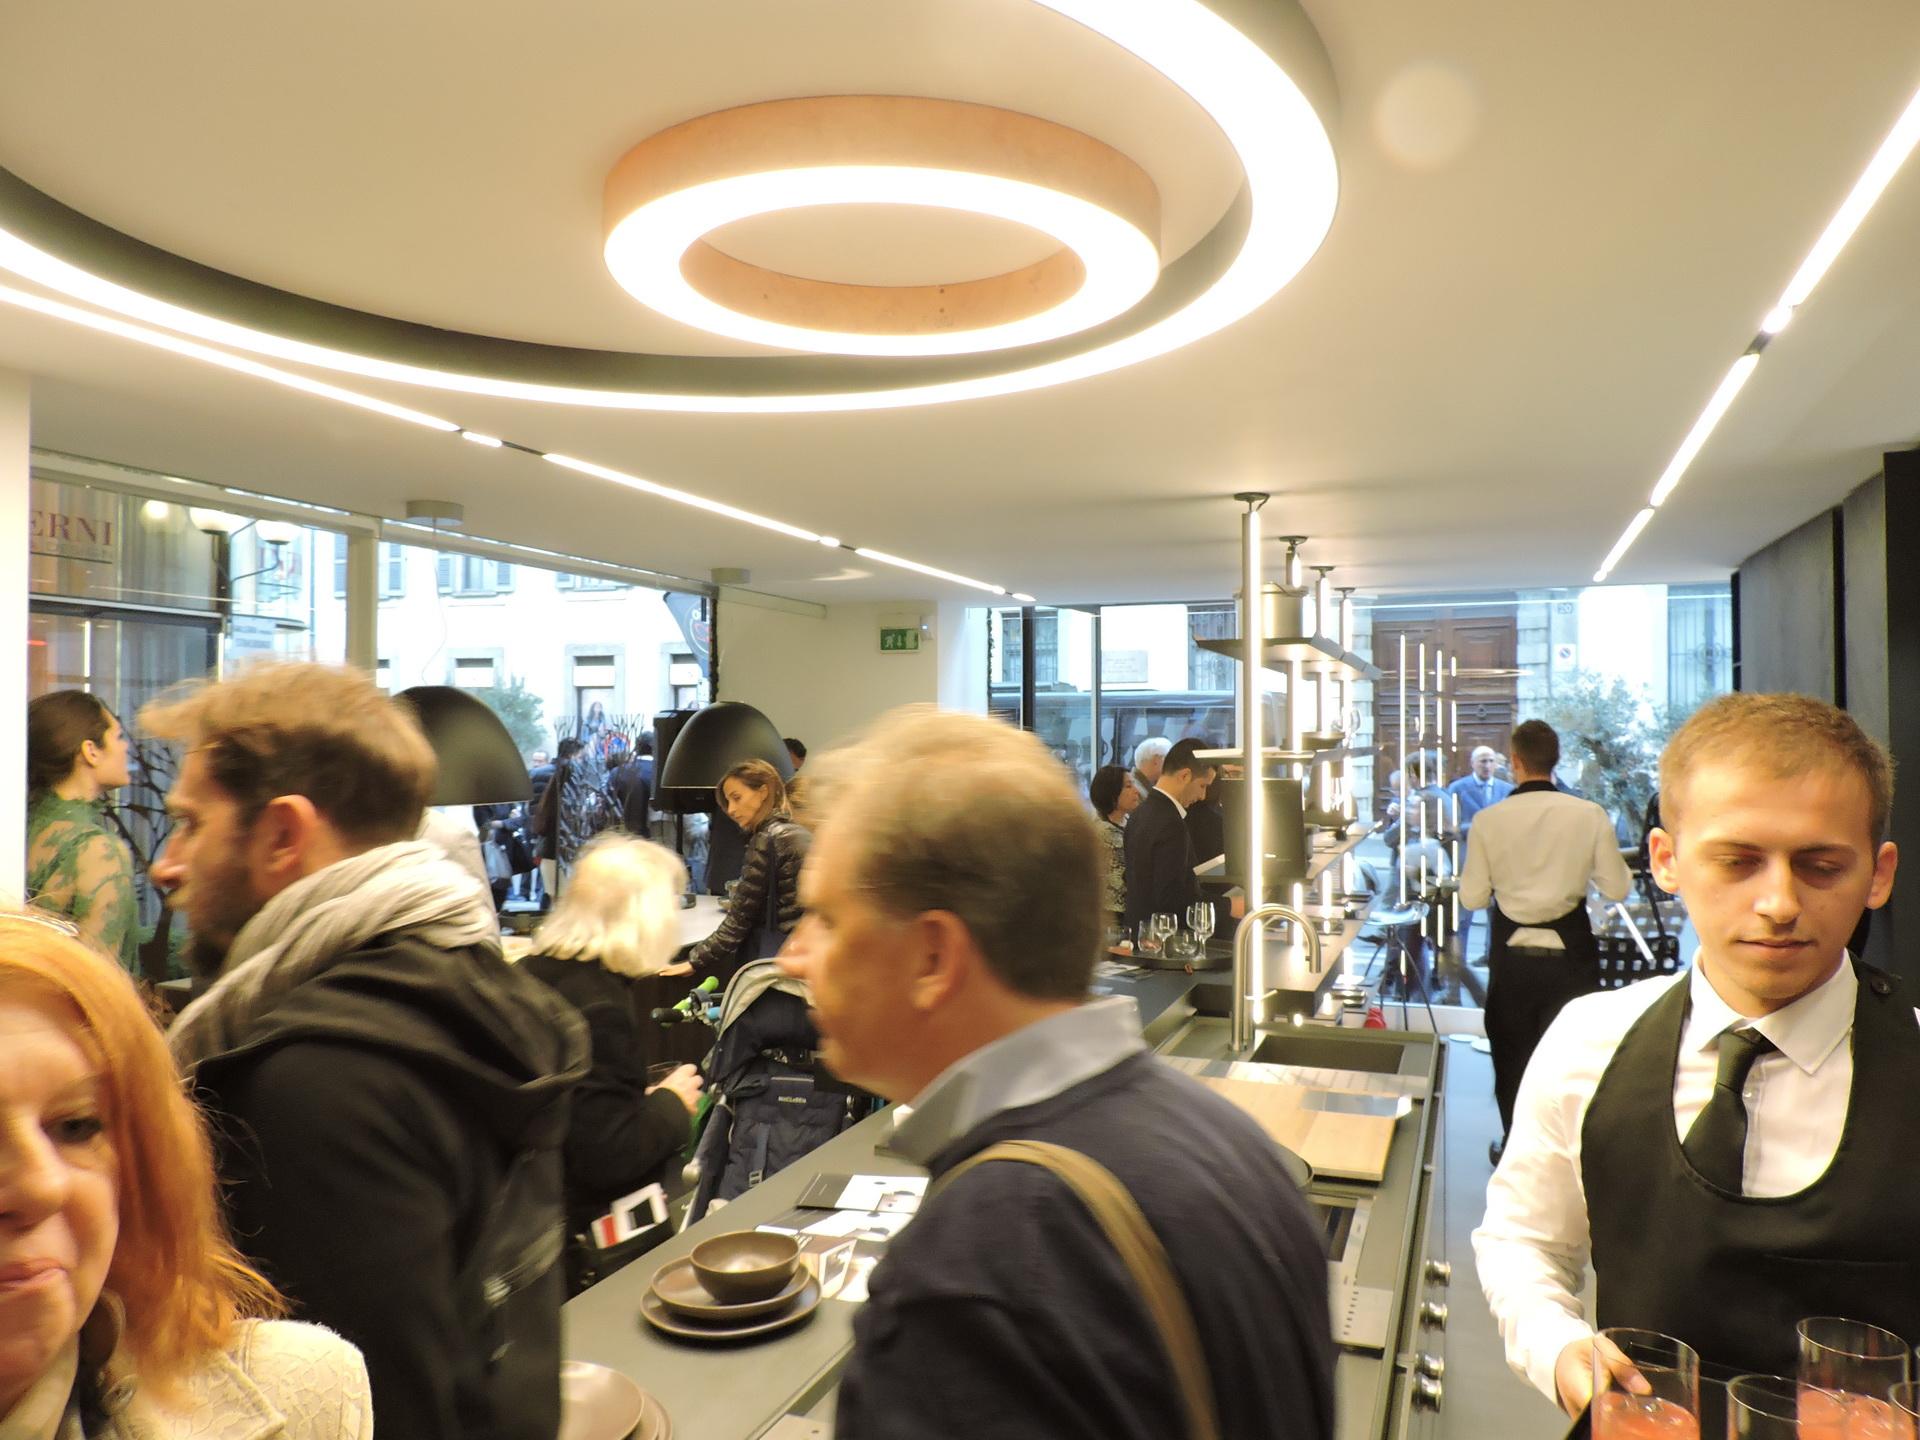 Fuorisalone 2017 - Desing Week 2017 - Binova Milano - cocktail con Davide Oldani e Schonhuber Franchi 018